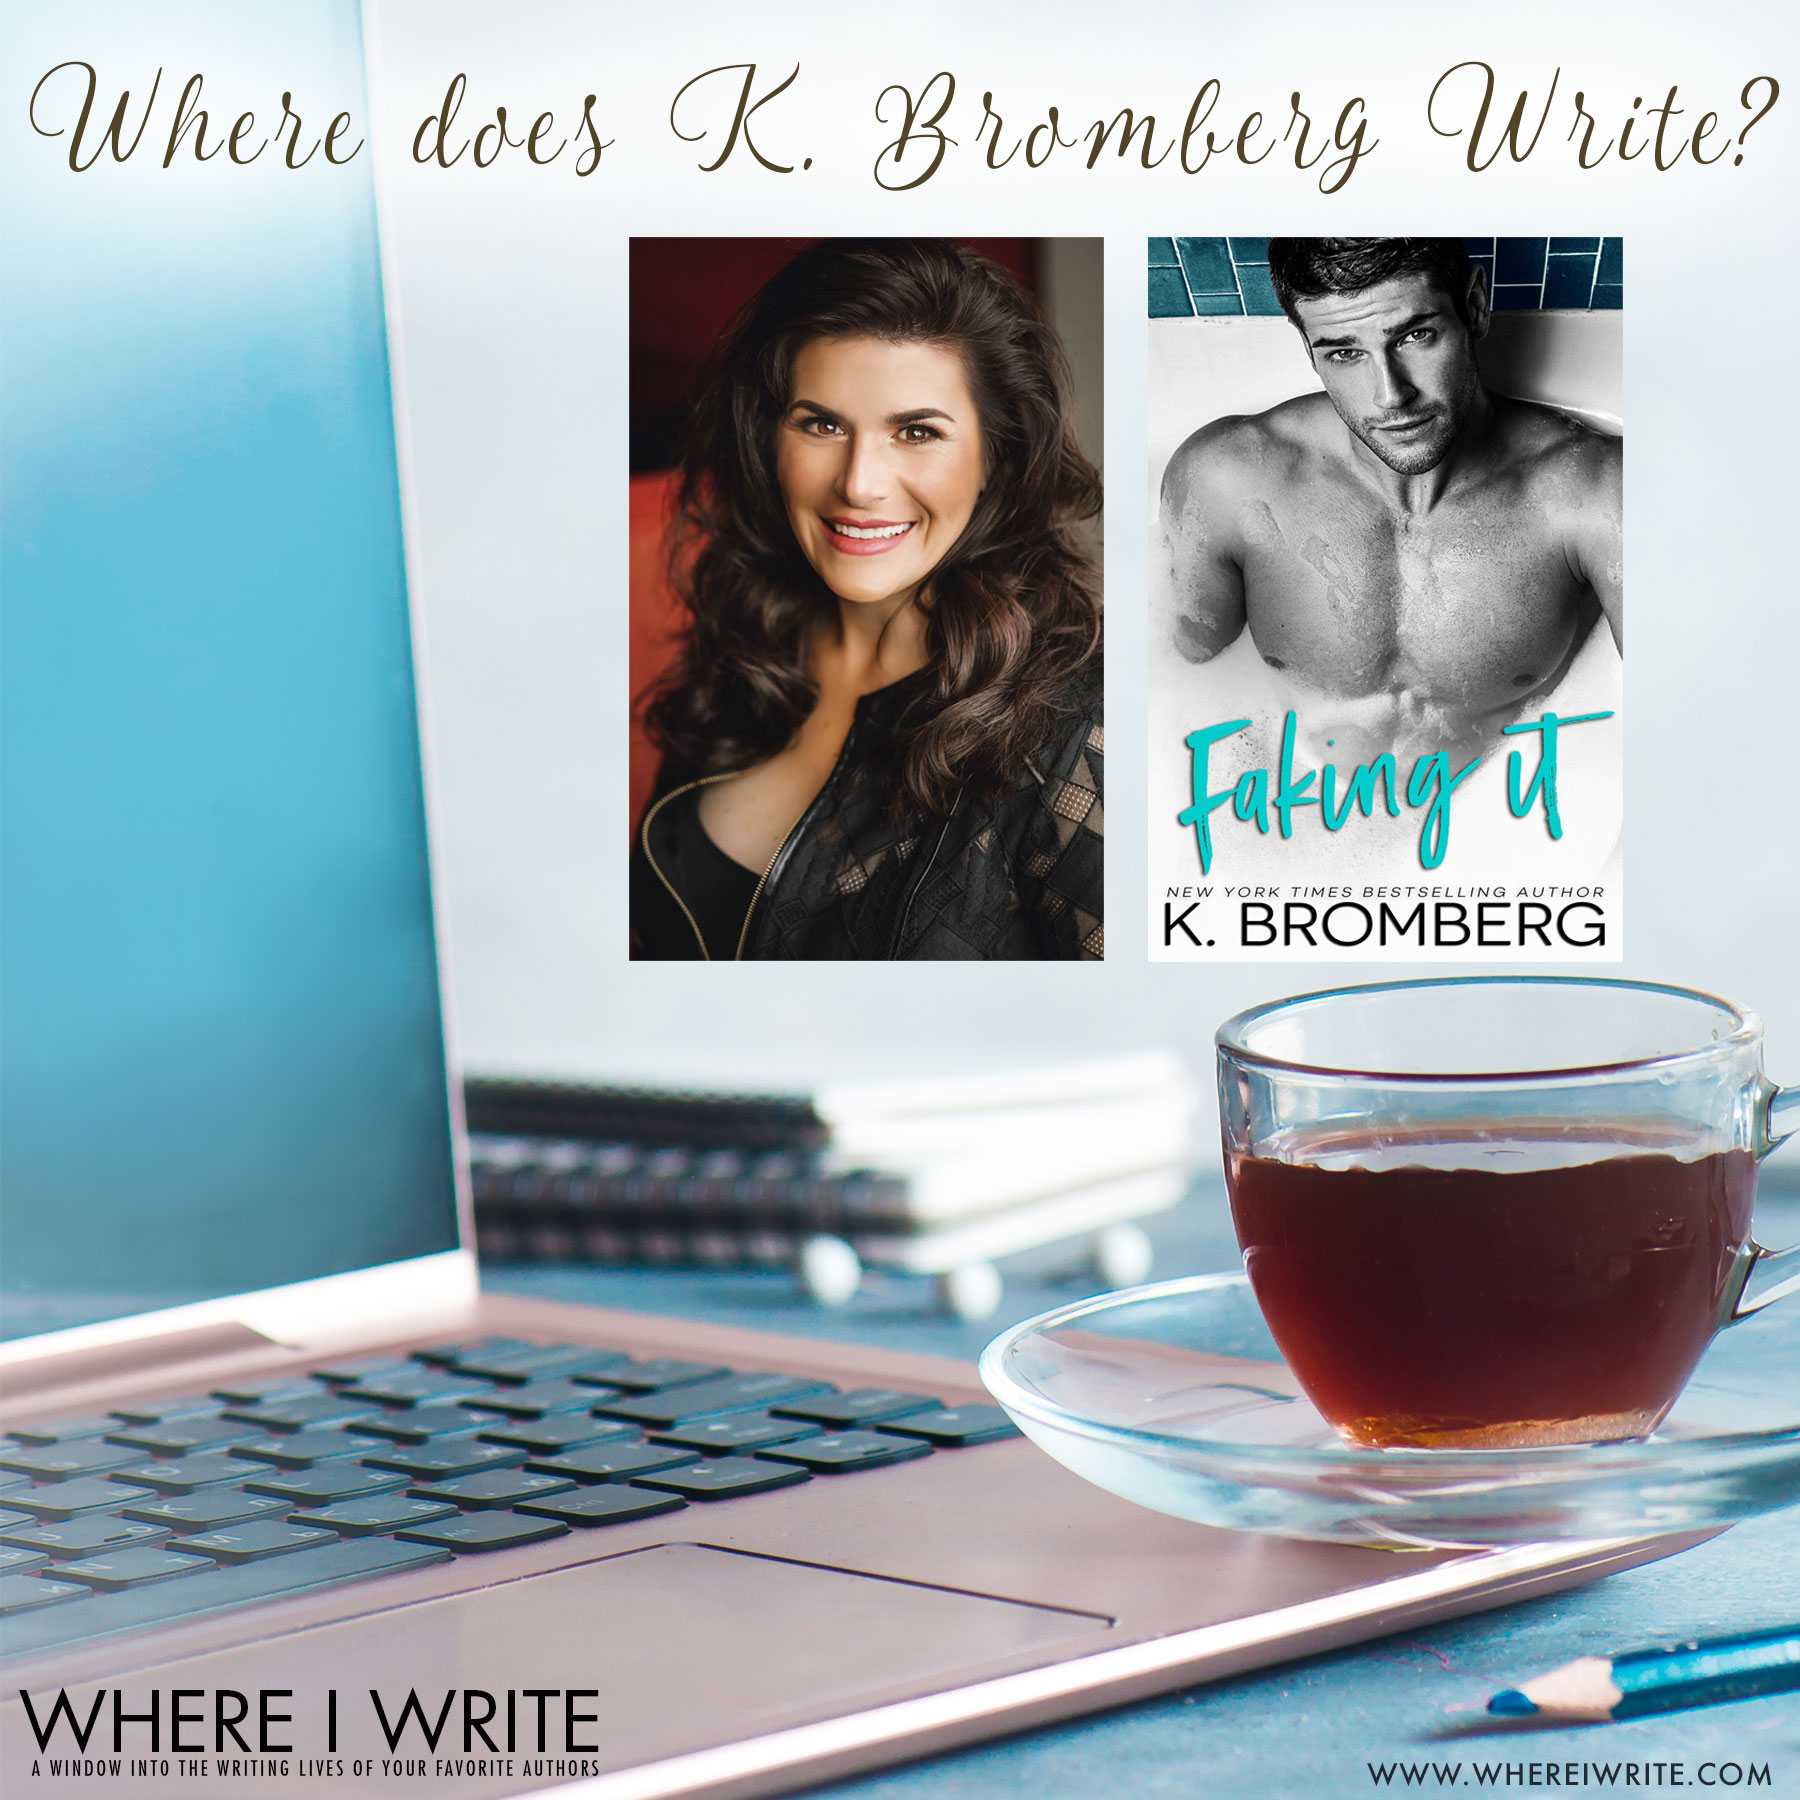 AuthorWrites-KBromberg-Square-2.jpg